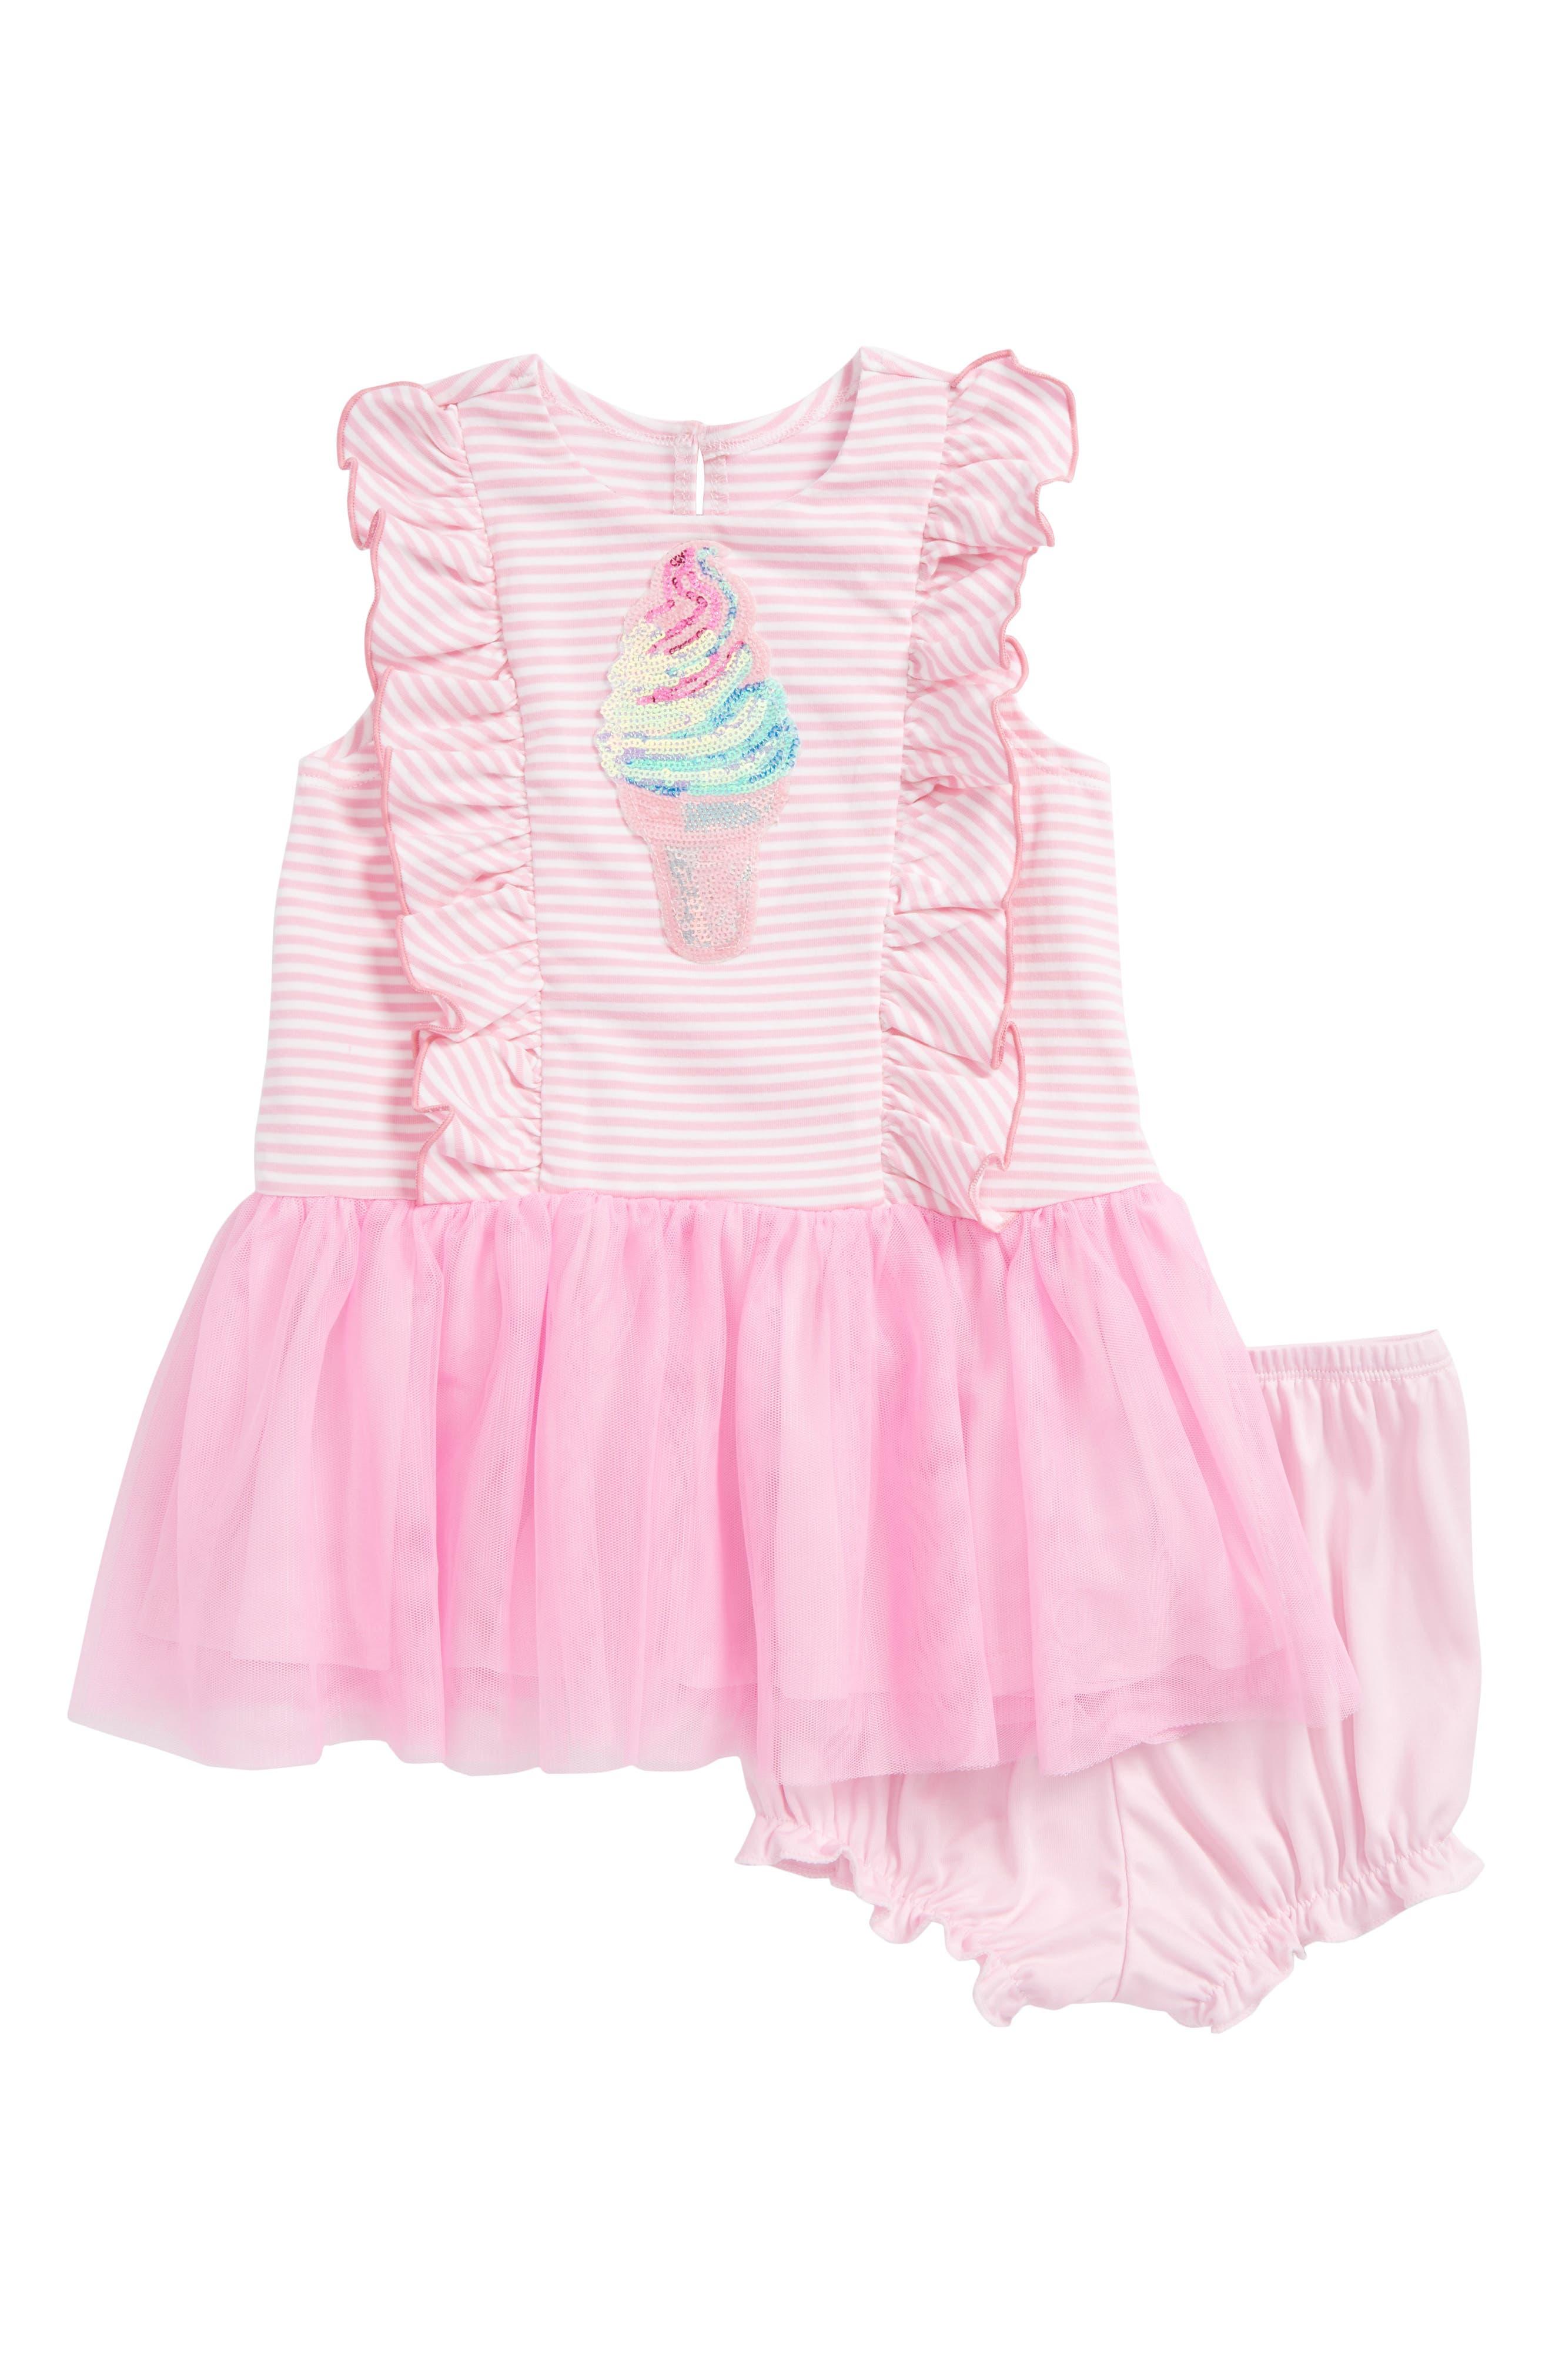 Ice Cream Cone Tutu Dress,                             Main thumbnail 1, color,                             Pink/ White